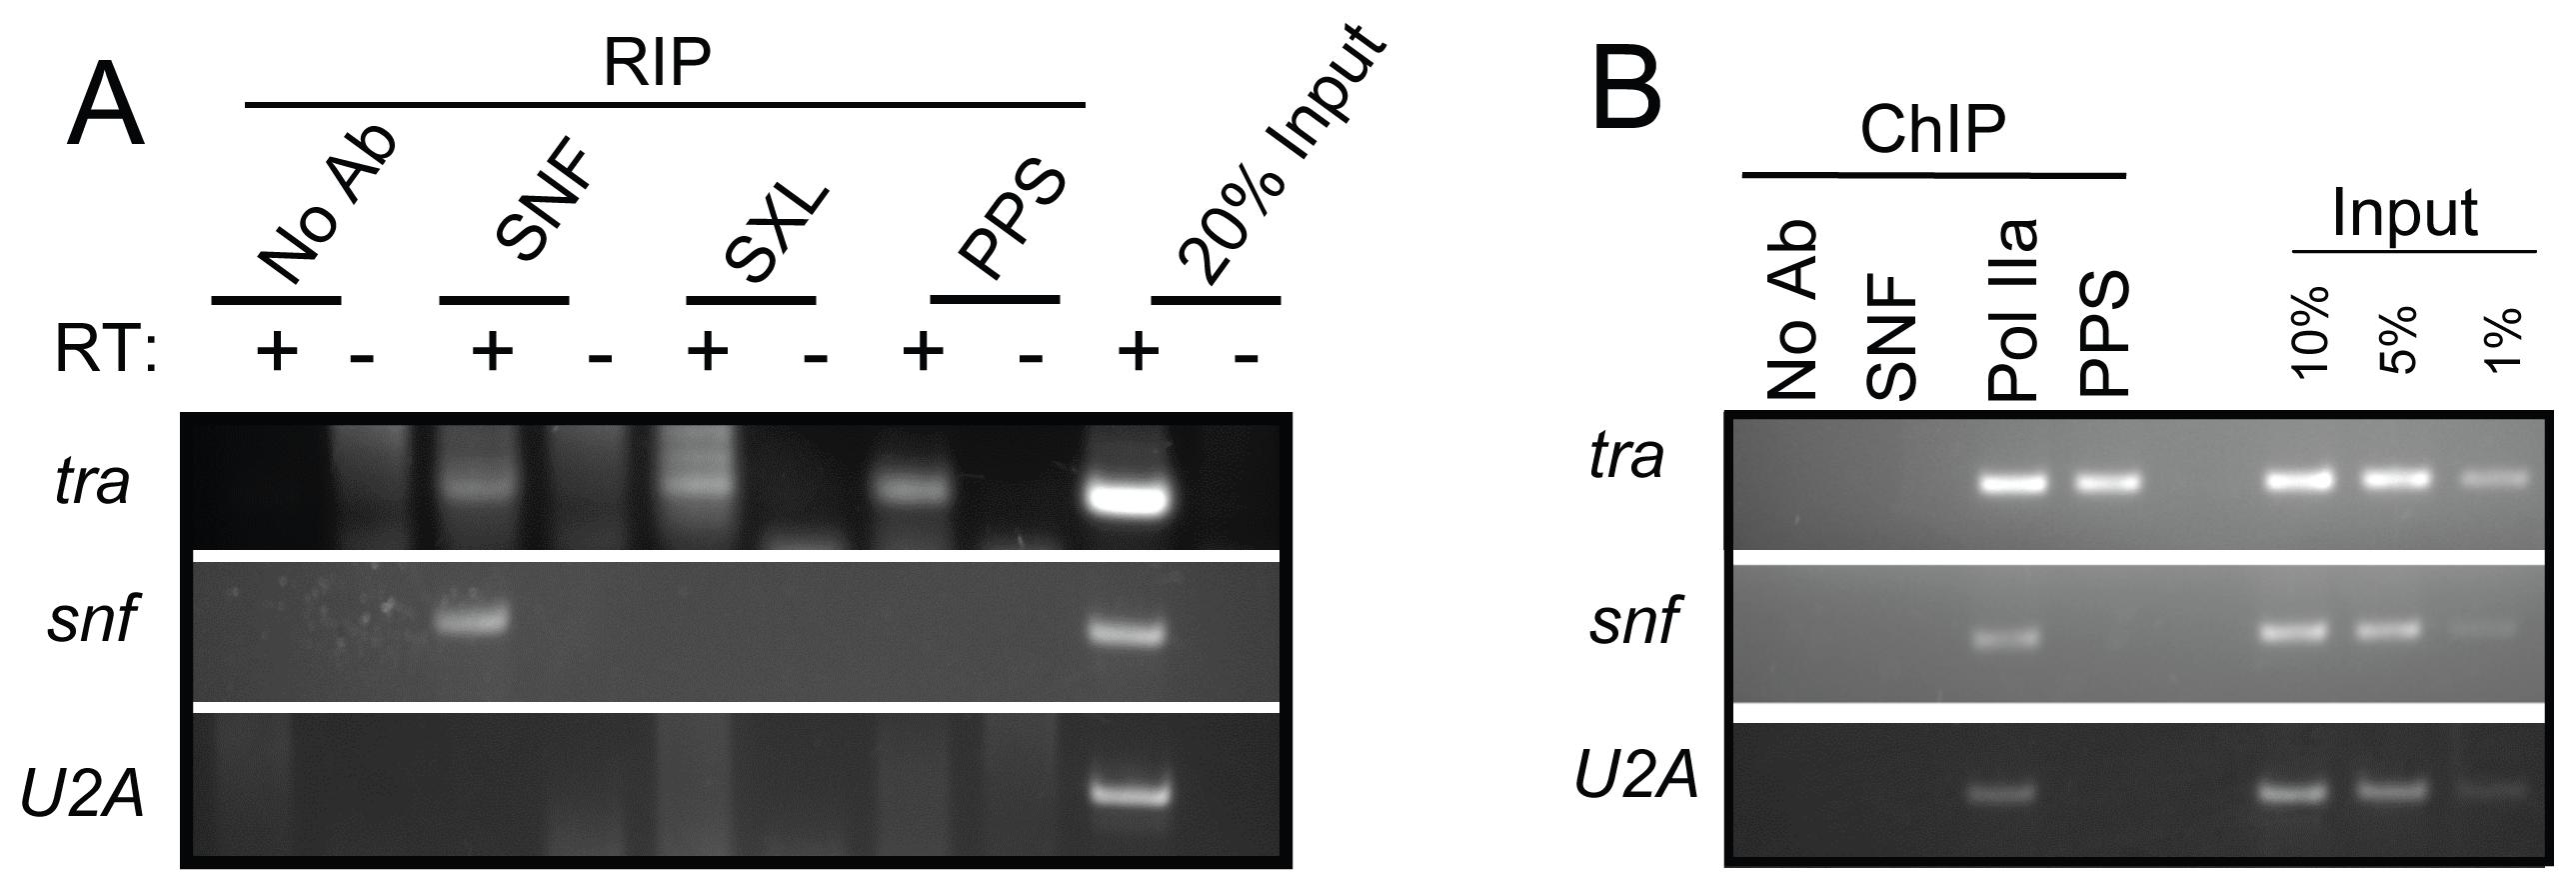 <i>tra</i> is a PPS target gene.